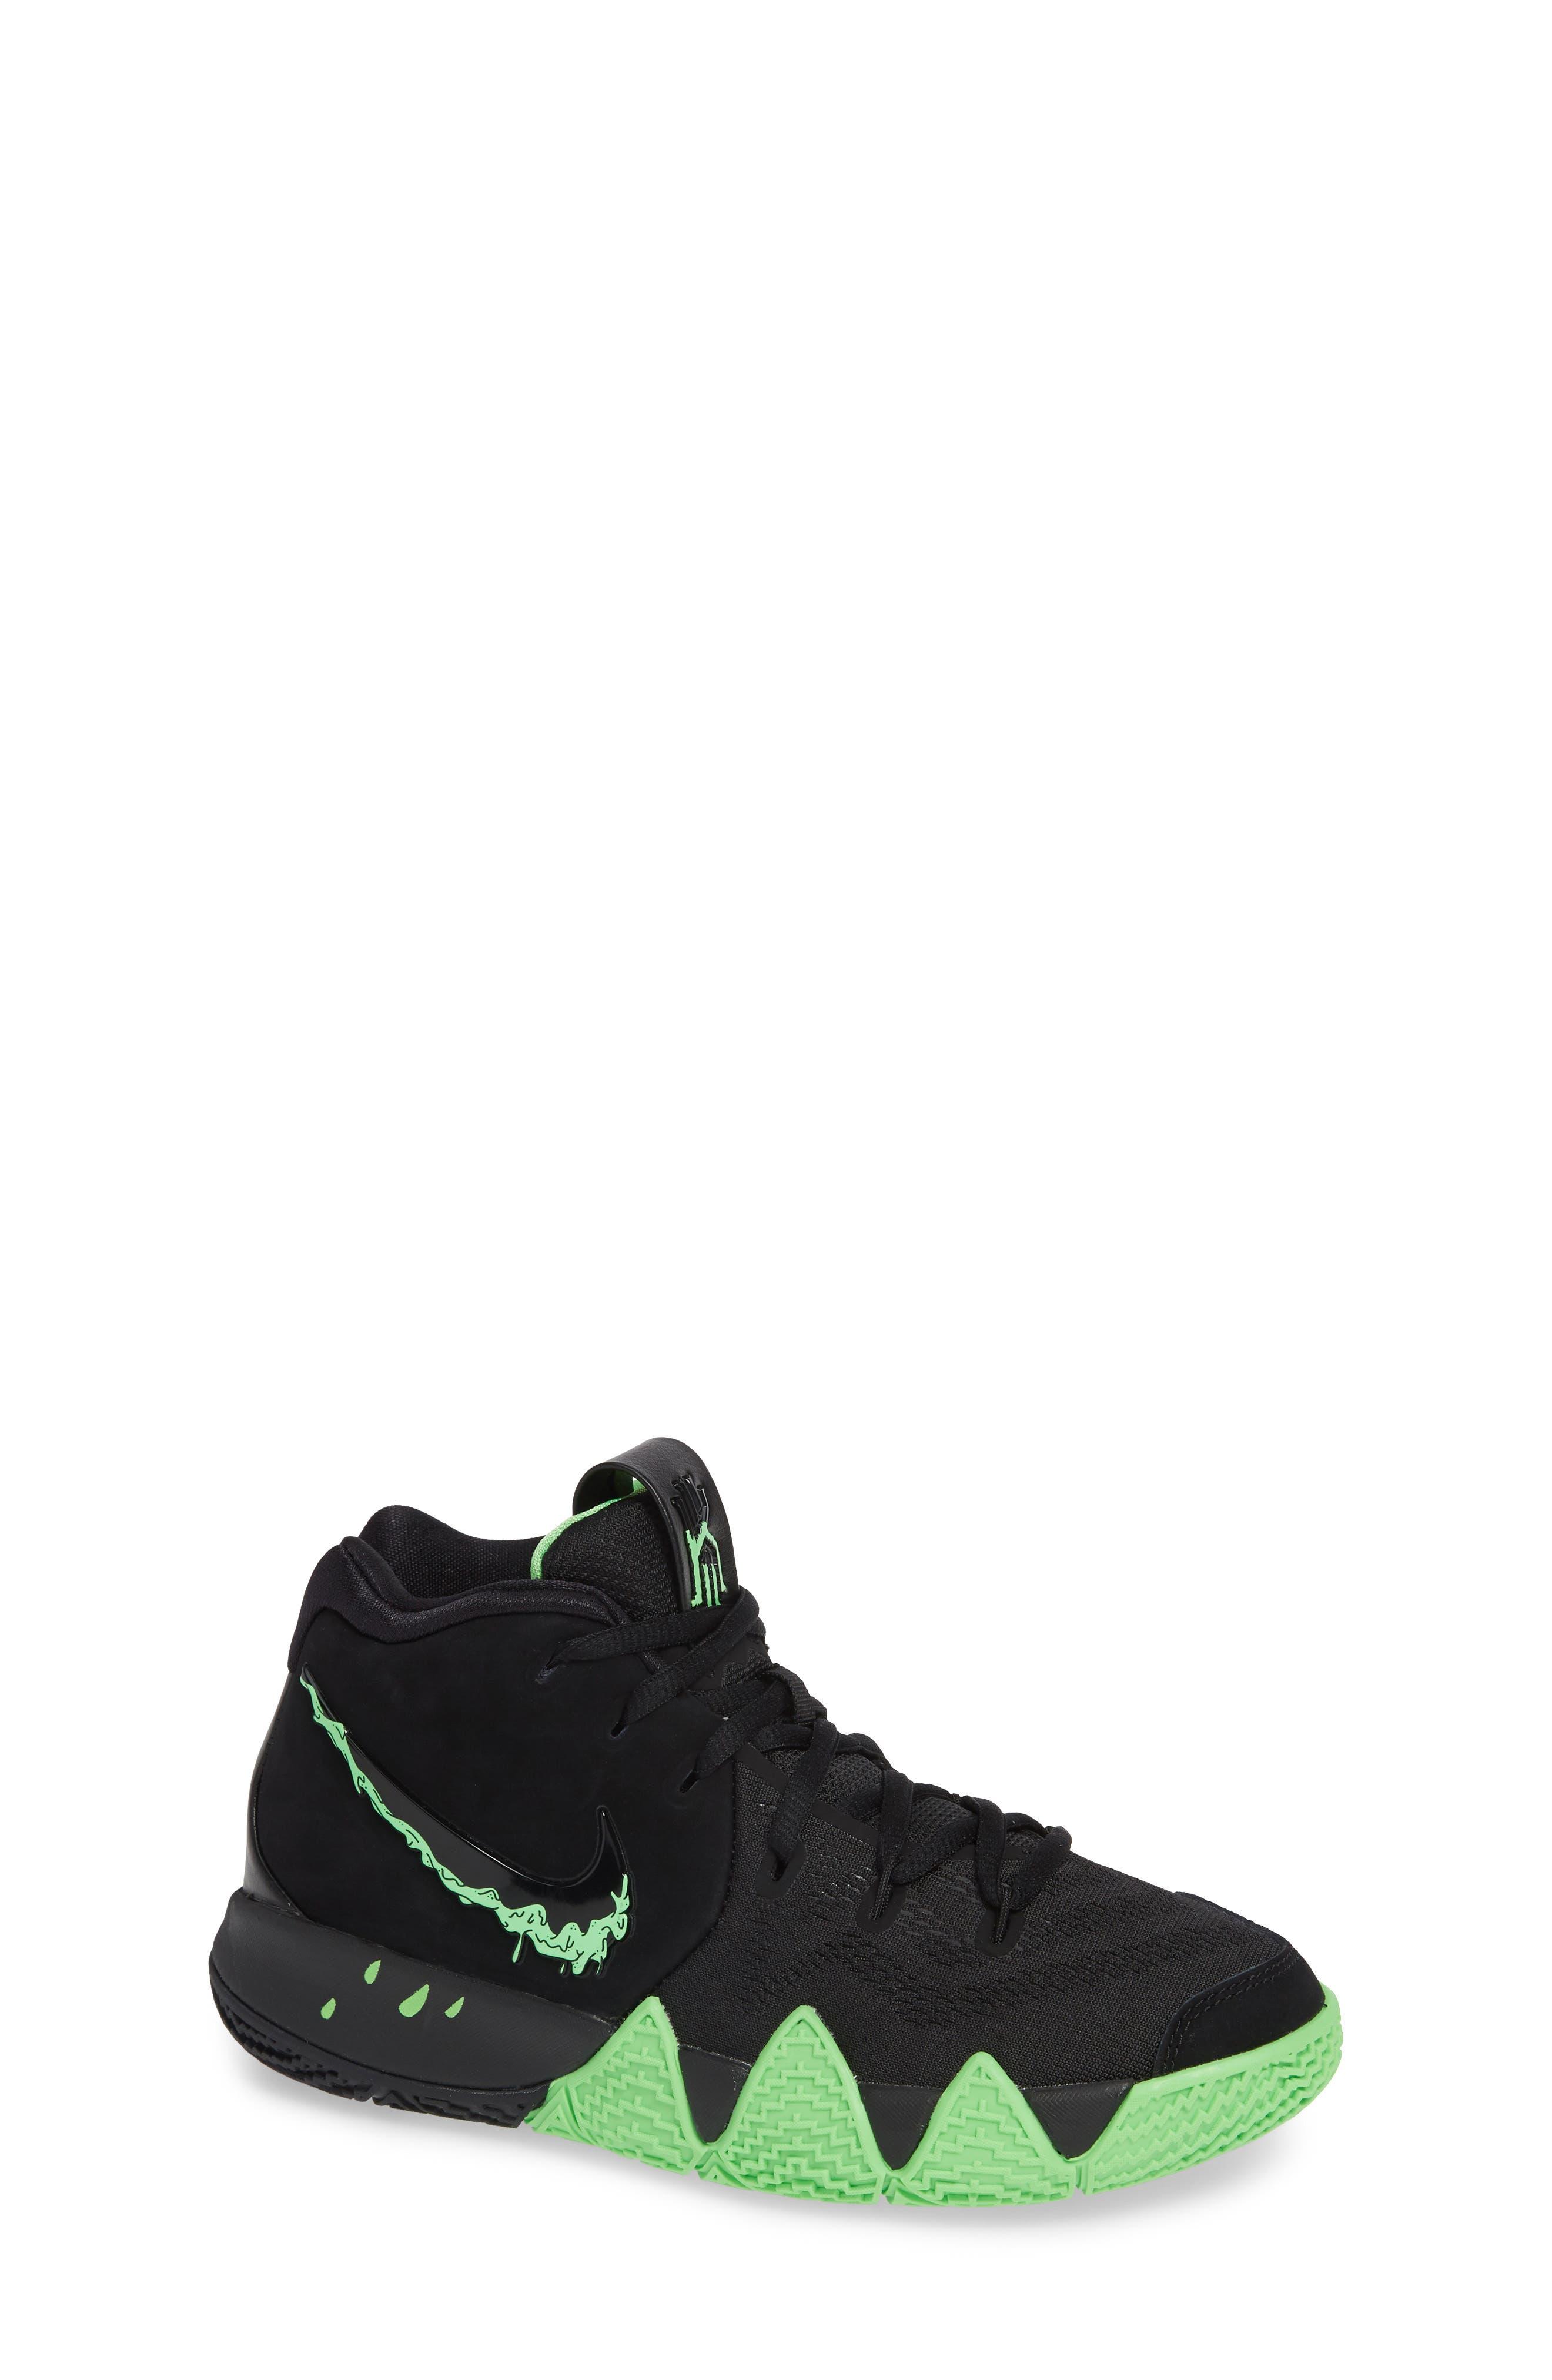 Kyrie 4 Basketball Shoe,                         Main,                         color, BLACK/ RAGE GREEN